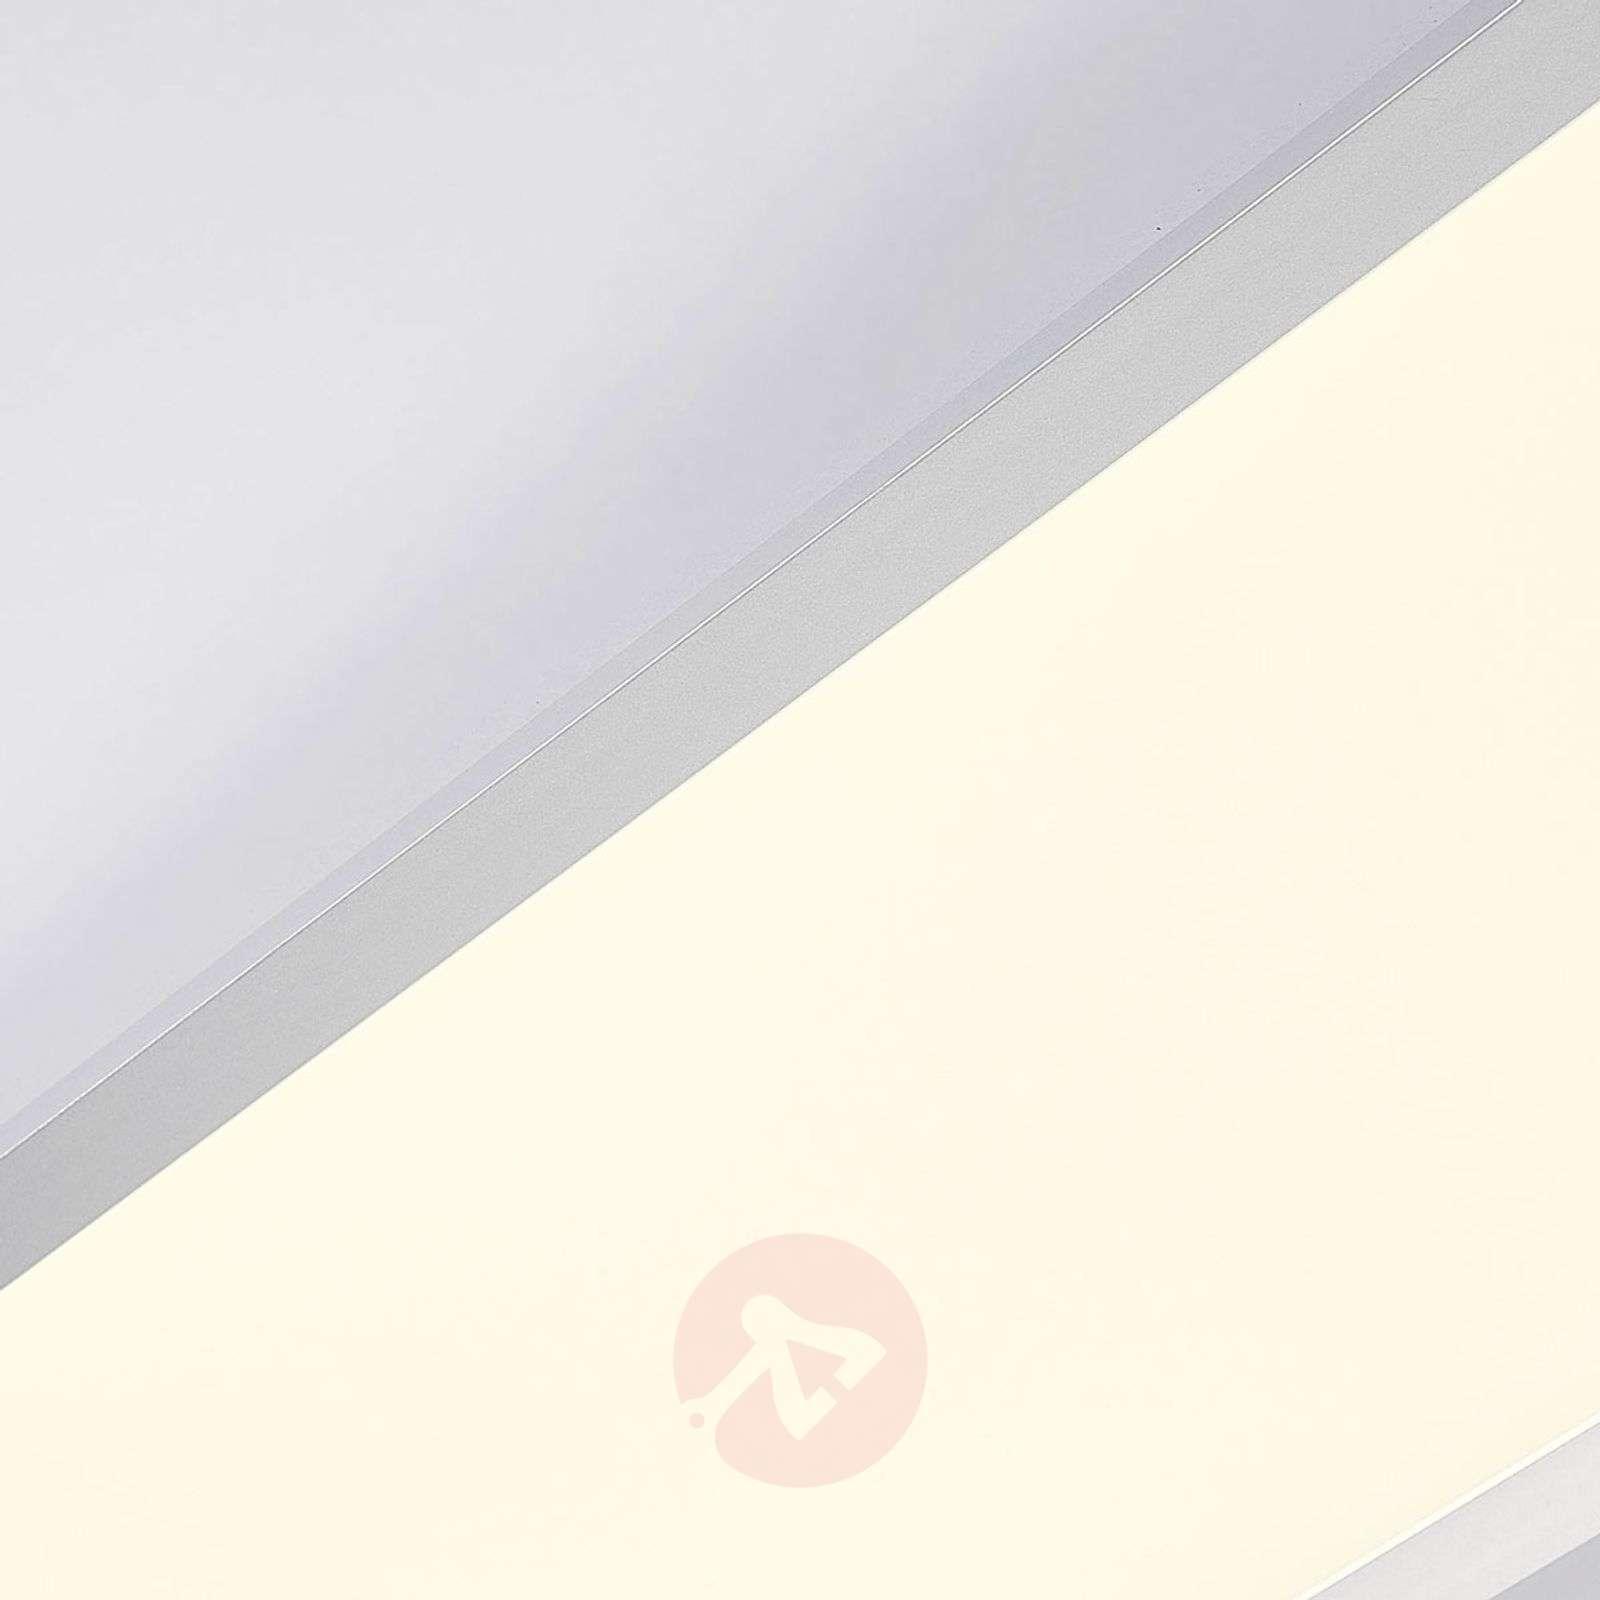 Vaihdettava valon väri – LED-paneeli Lysander-9621561-01